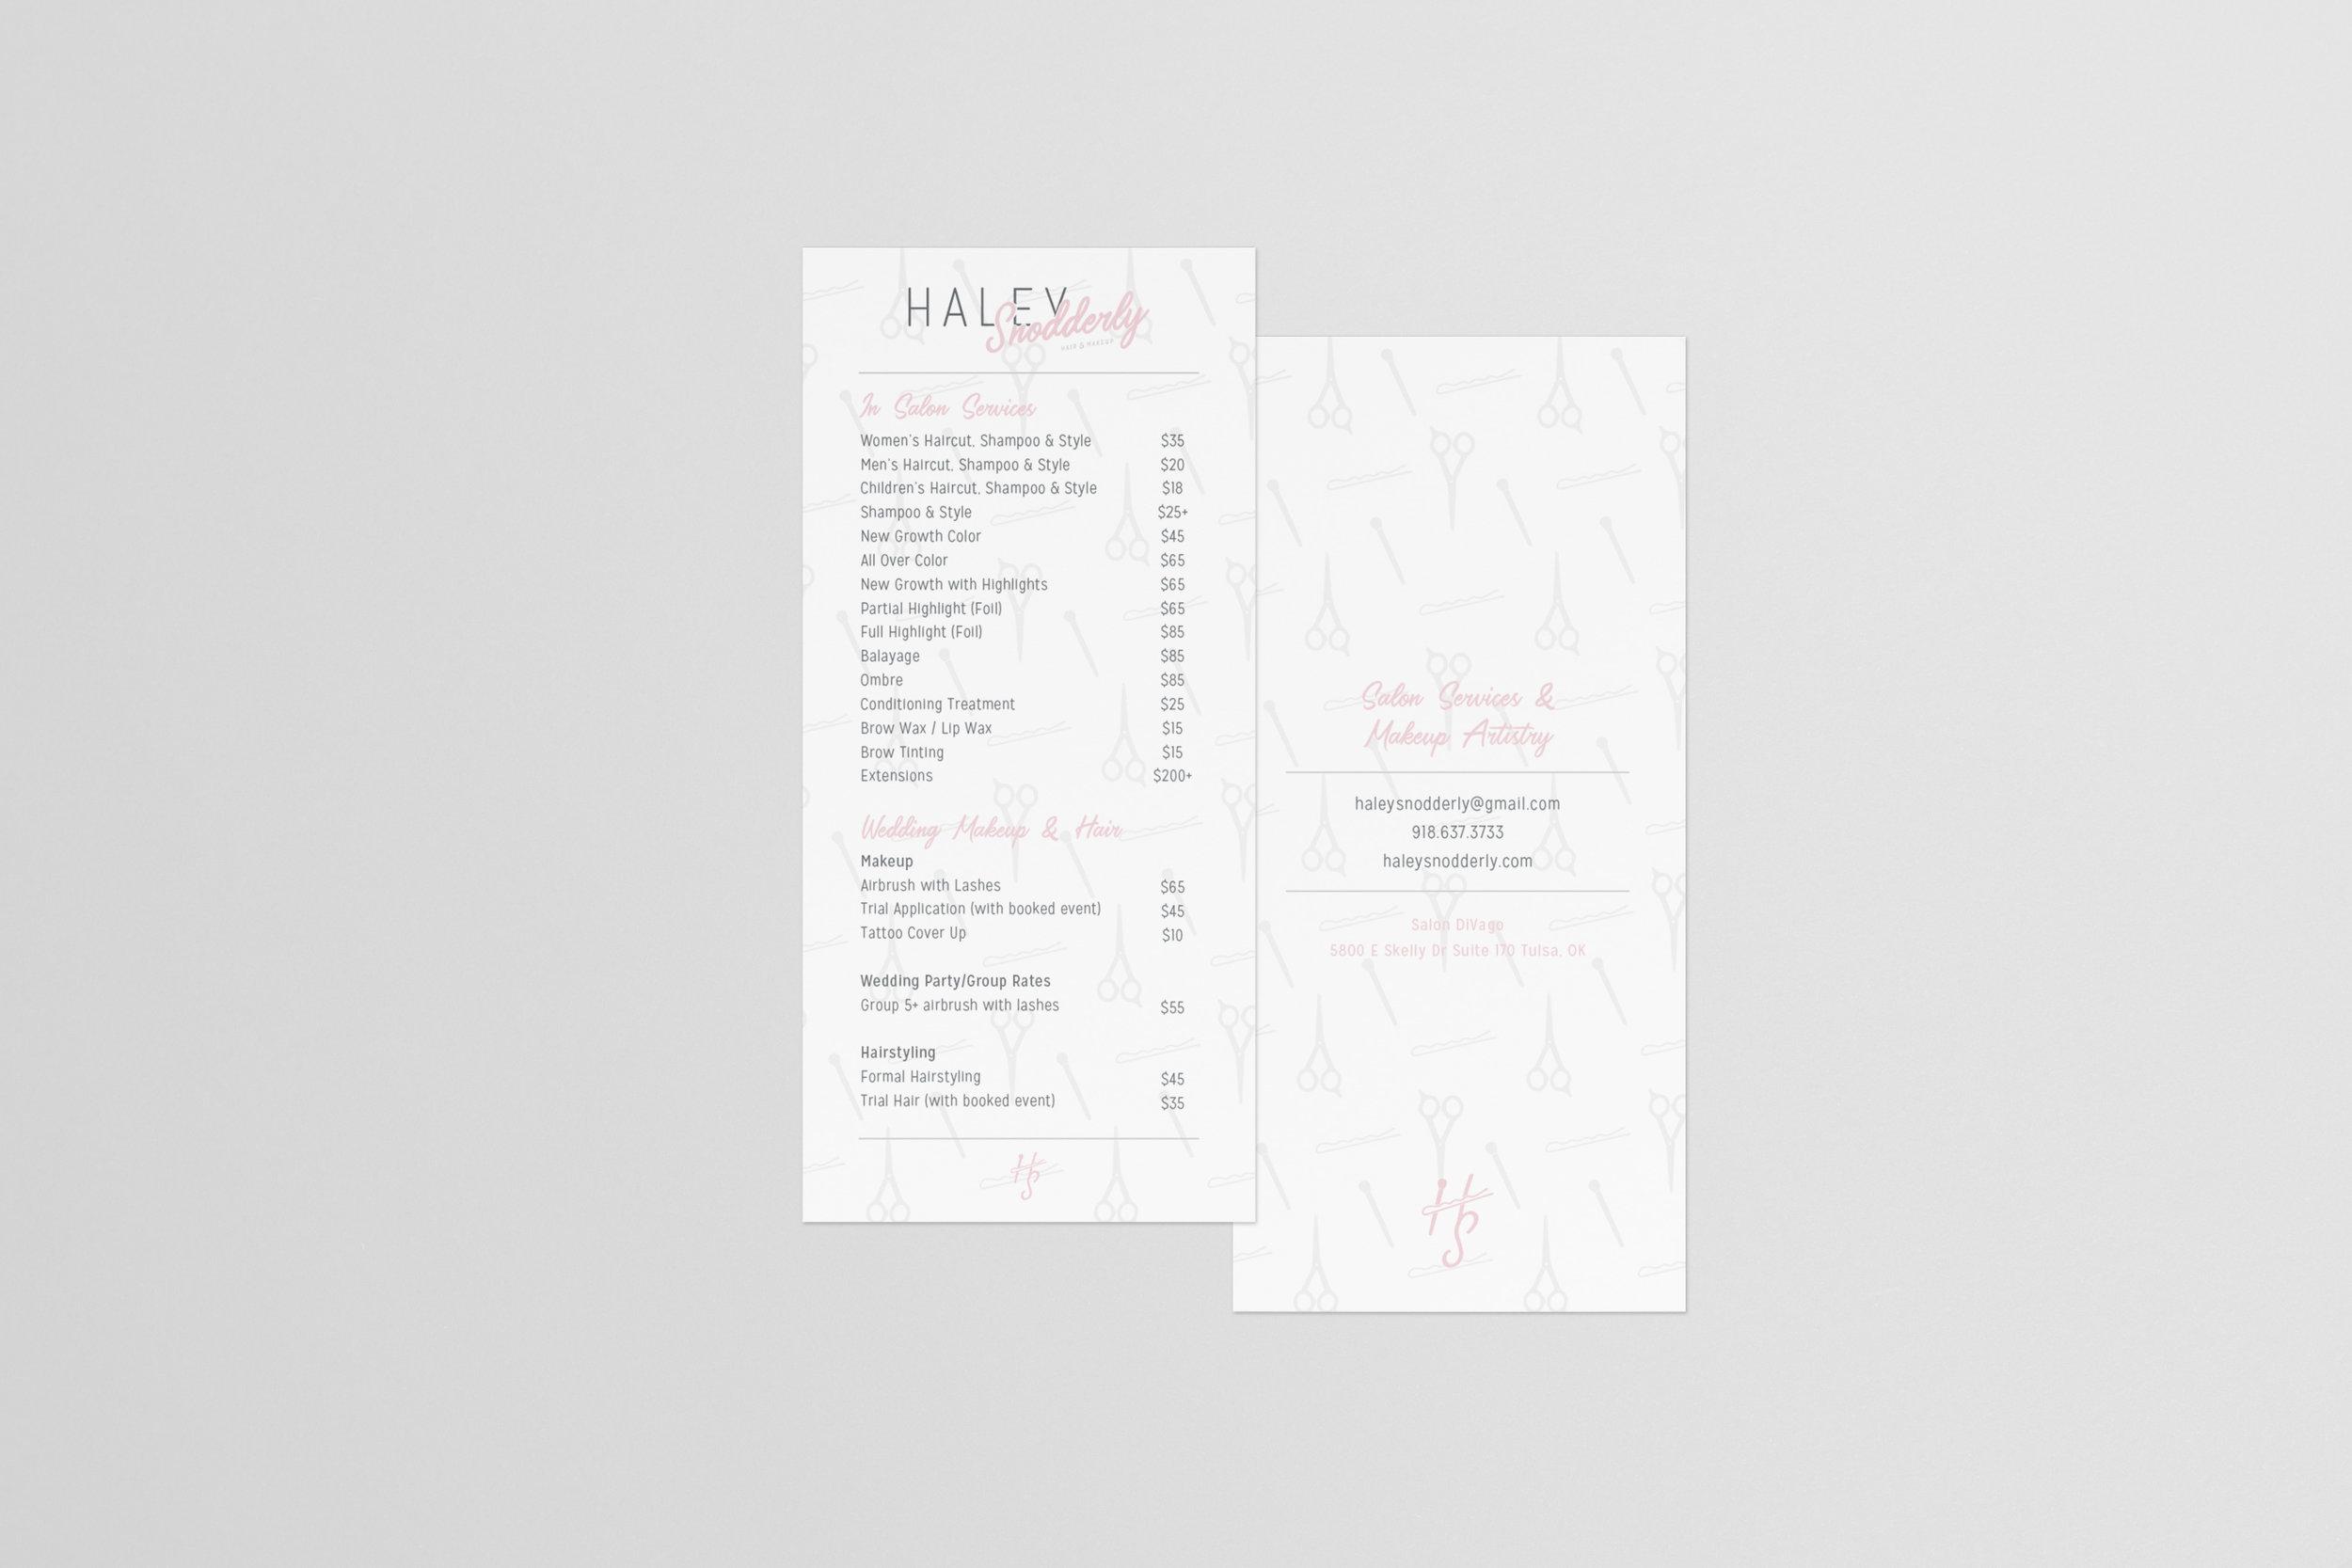 HaleySnoddery-Salon services menu-hair stylist-makeup artist-tulsa oklahoma-hayley bigham designs-graphic designer-brand designer tulsa